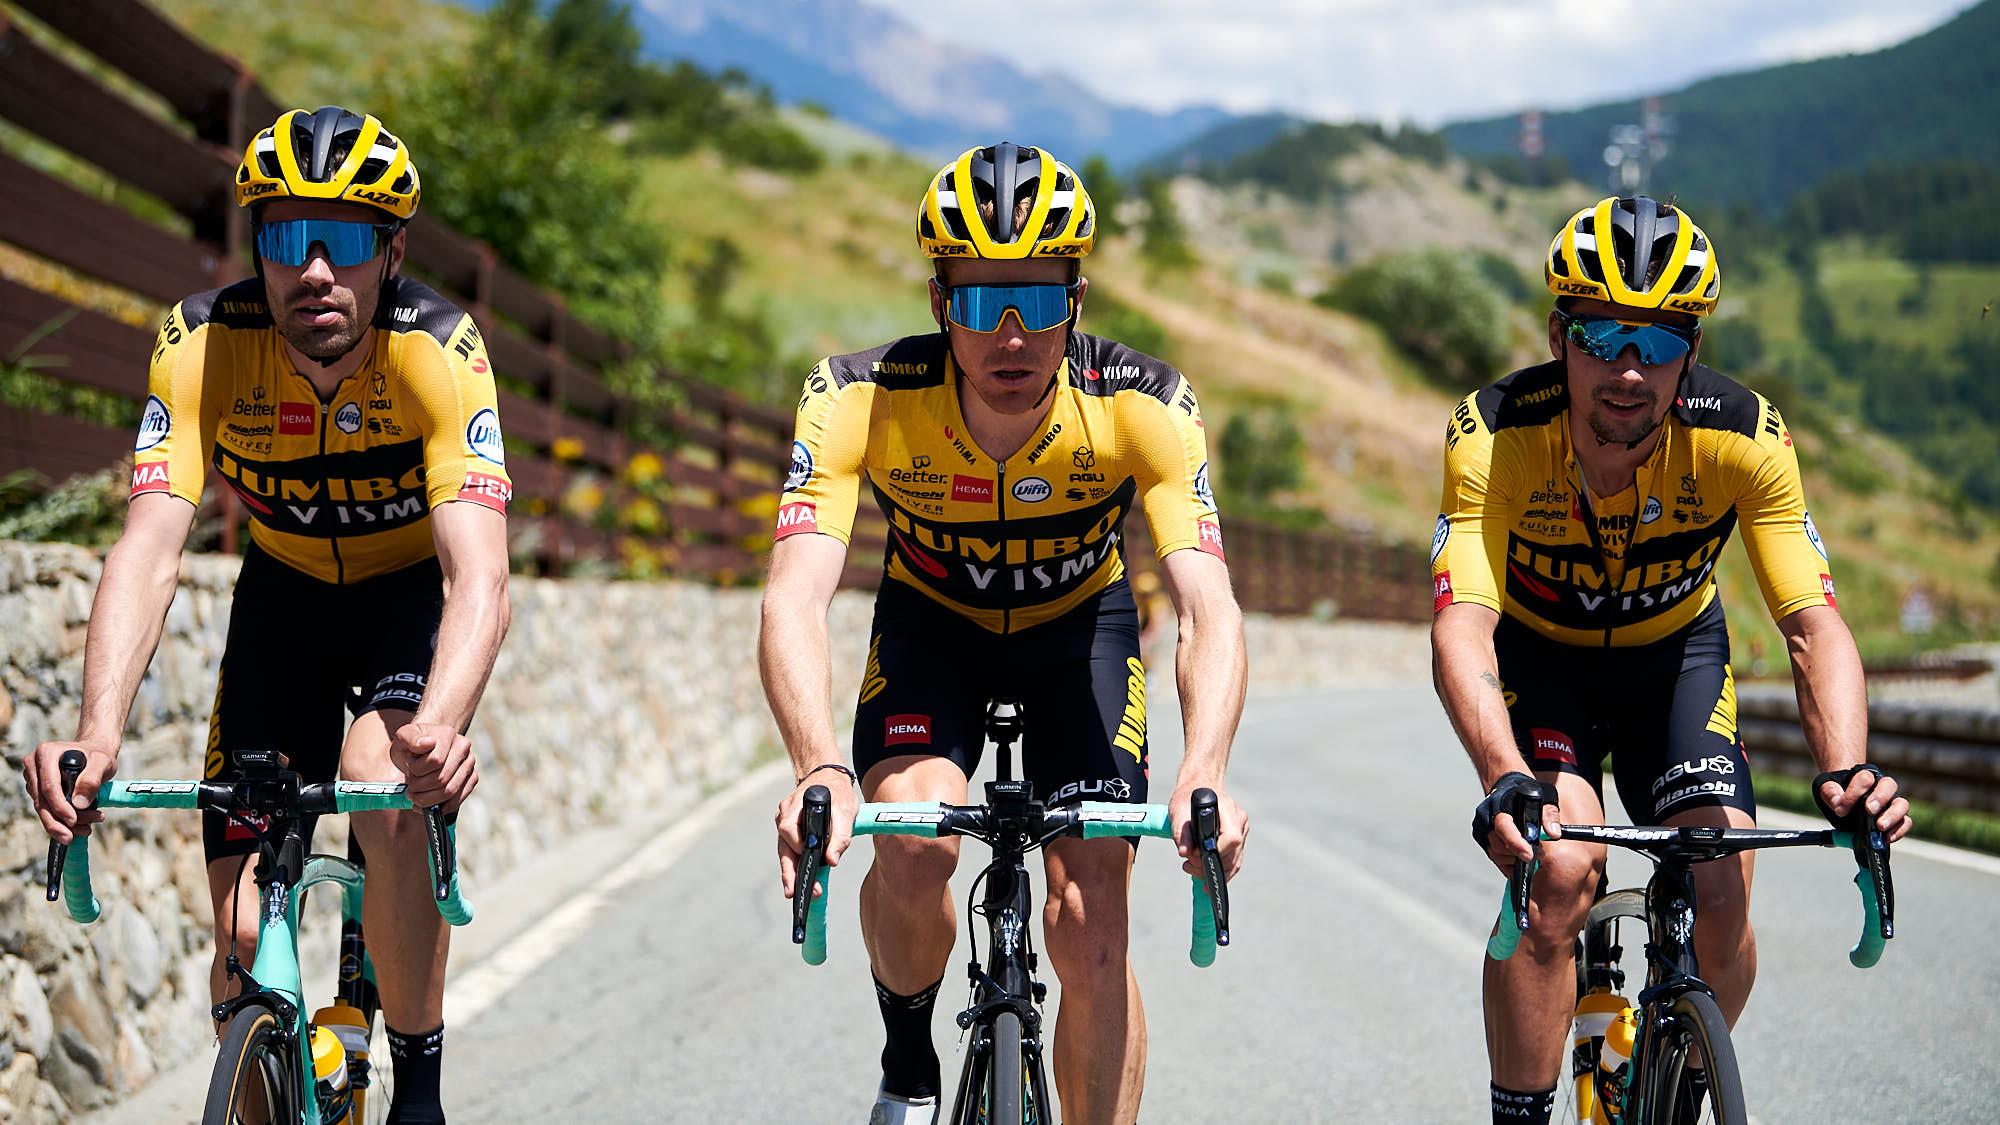 Jumbo-Visma's team leaders Primoz Roglic, Steven Kruijswijk and Tom Dumoulin training in Tignes